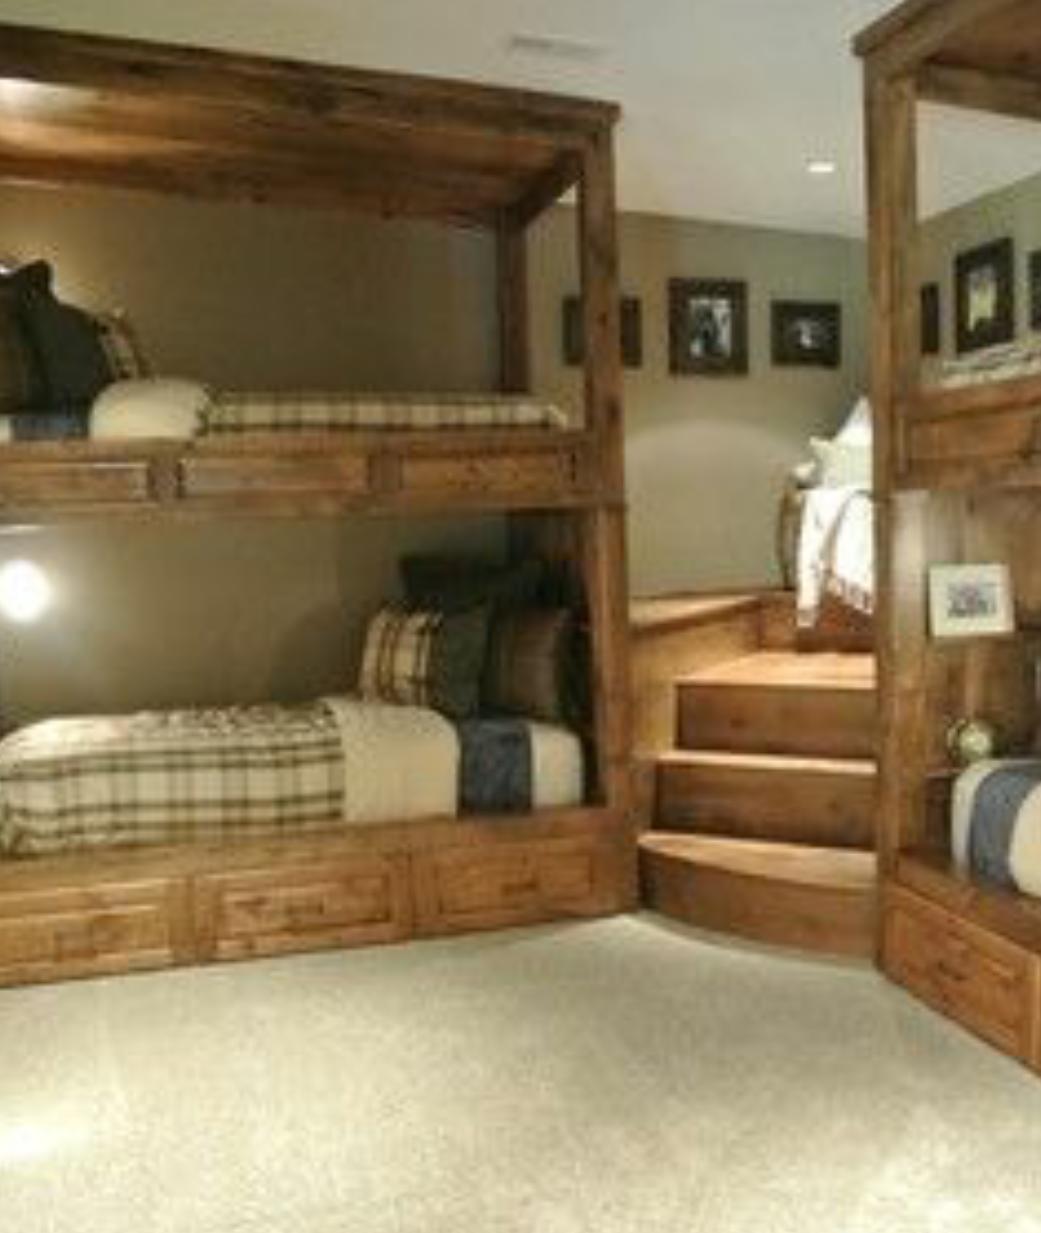 Under loft bed ideas  Bunk beds  vacaction home ideas  Pinterest  Bunk bed Bedrooms